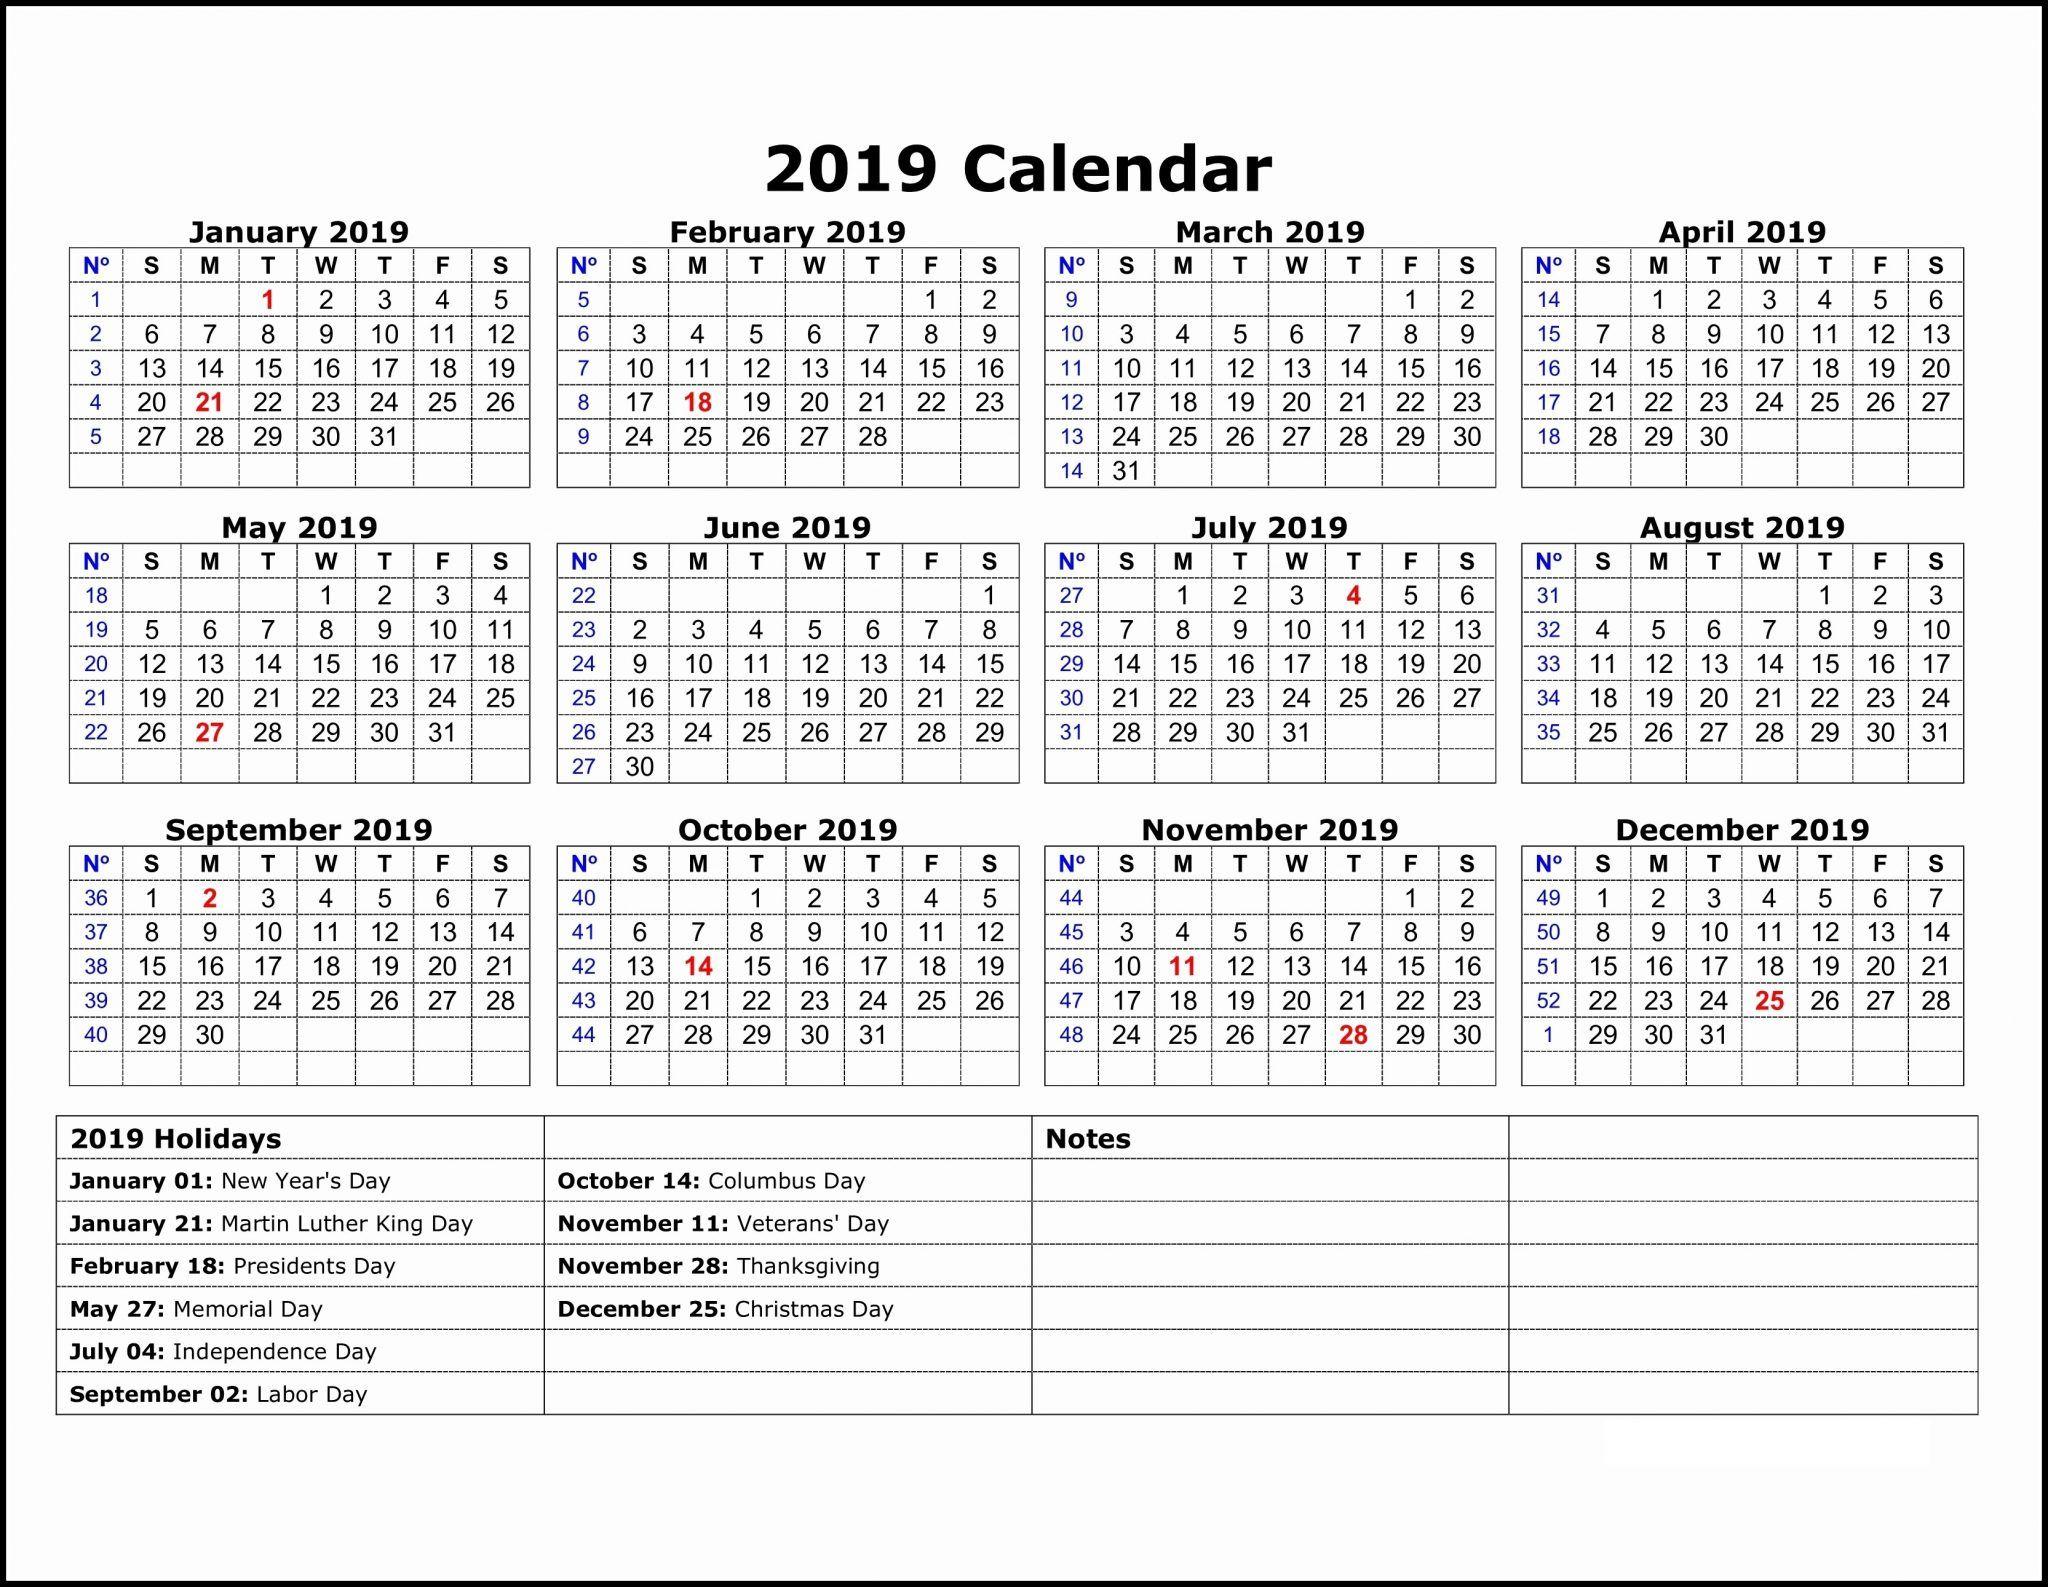 2019 Calendar Template One Page | Calendar 2019 Template